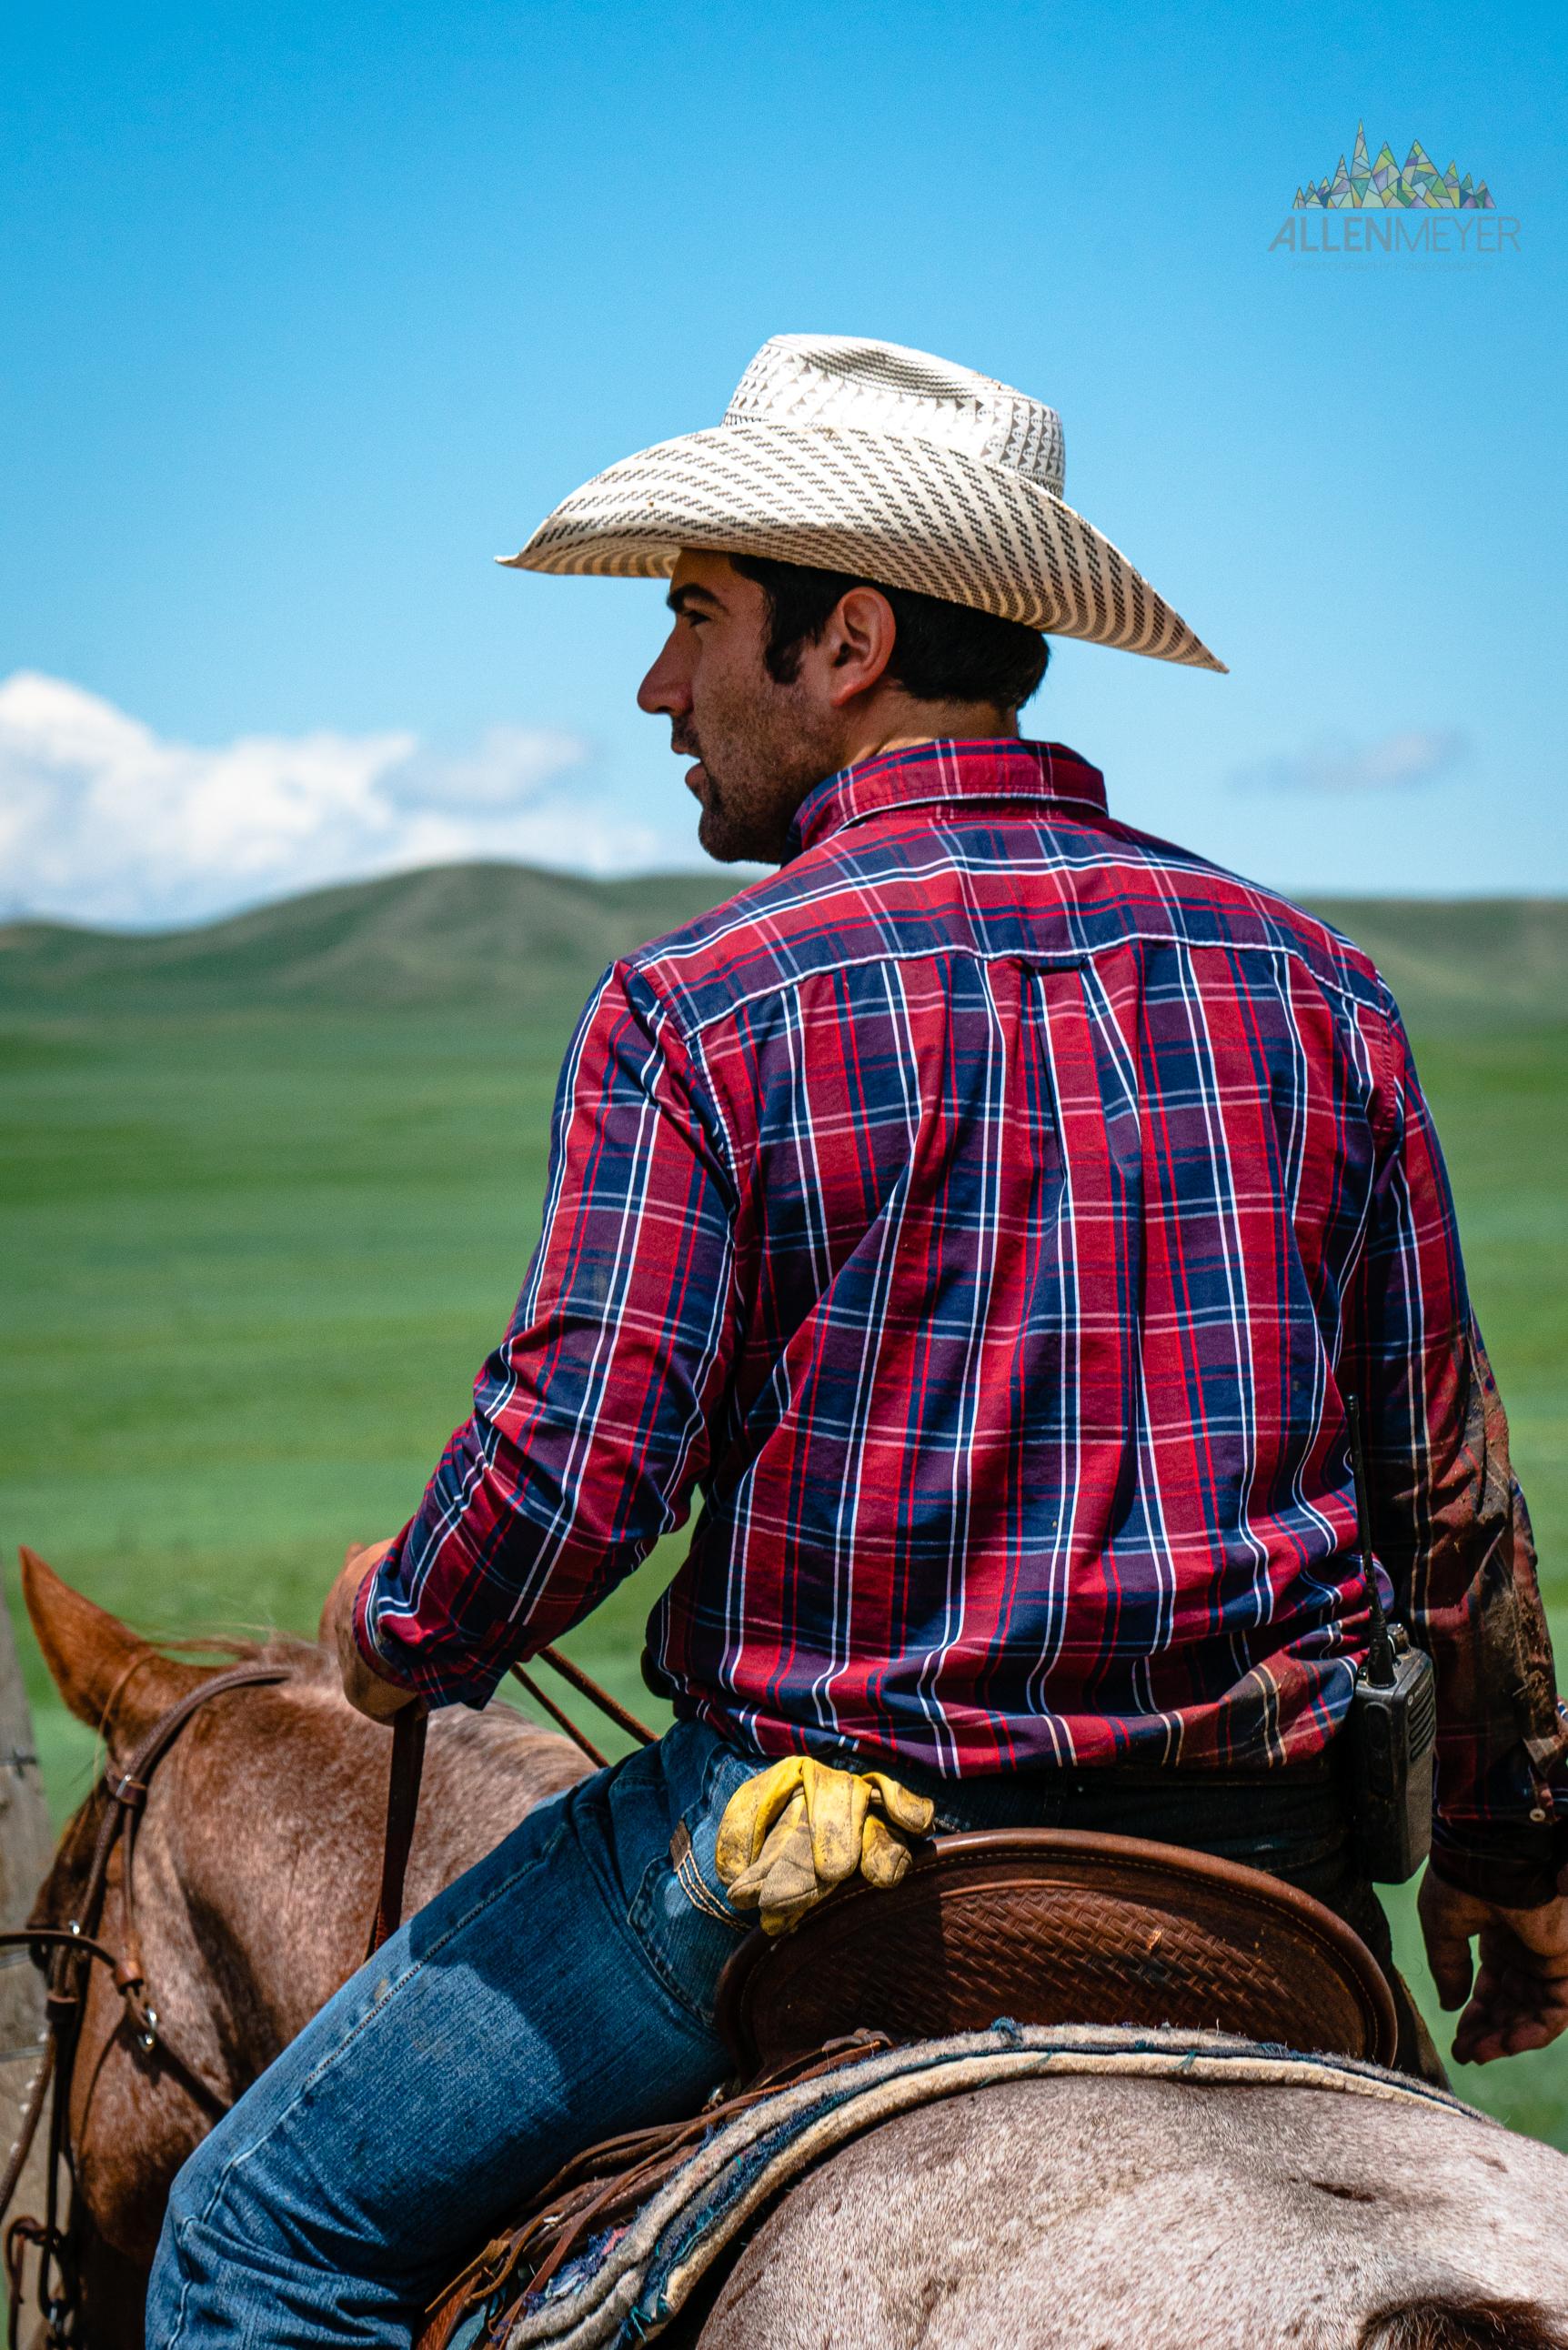 Outdoor Adventures In Cheyenne, Wyoming; Photography by Allen Meyer-04190.jpg